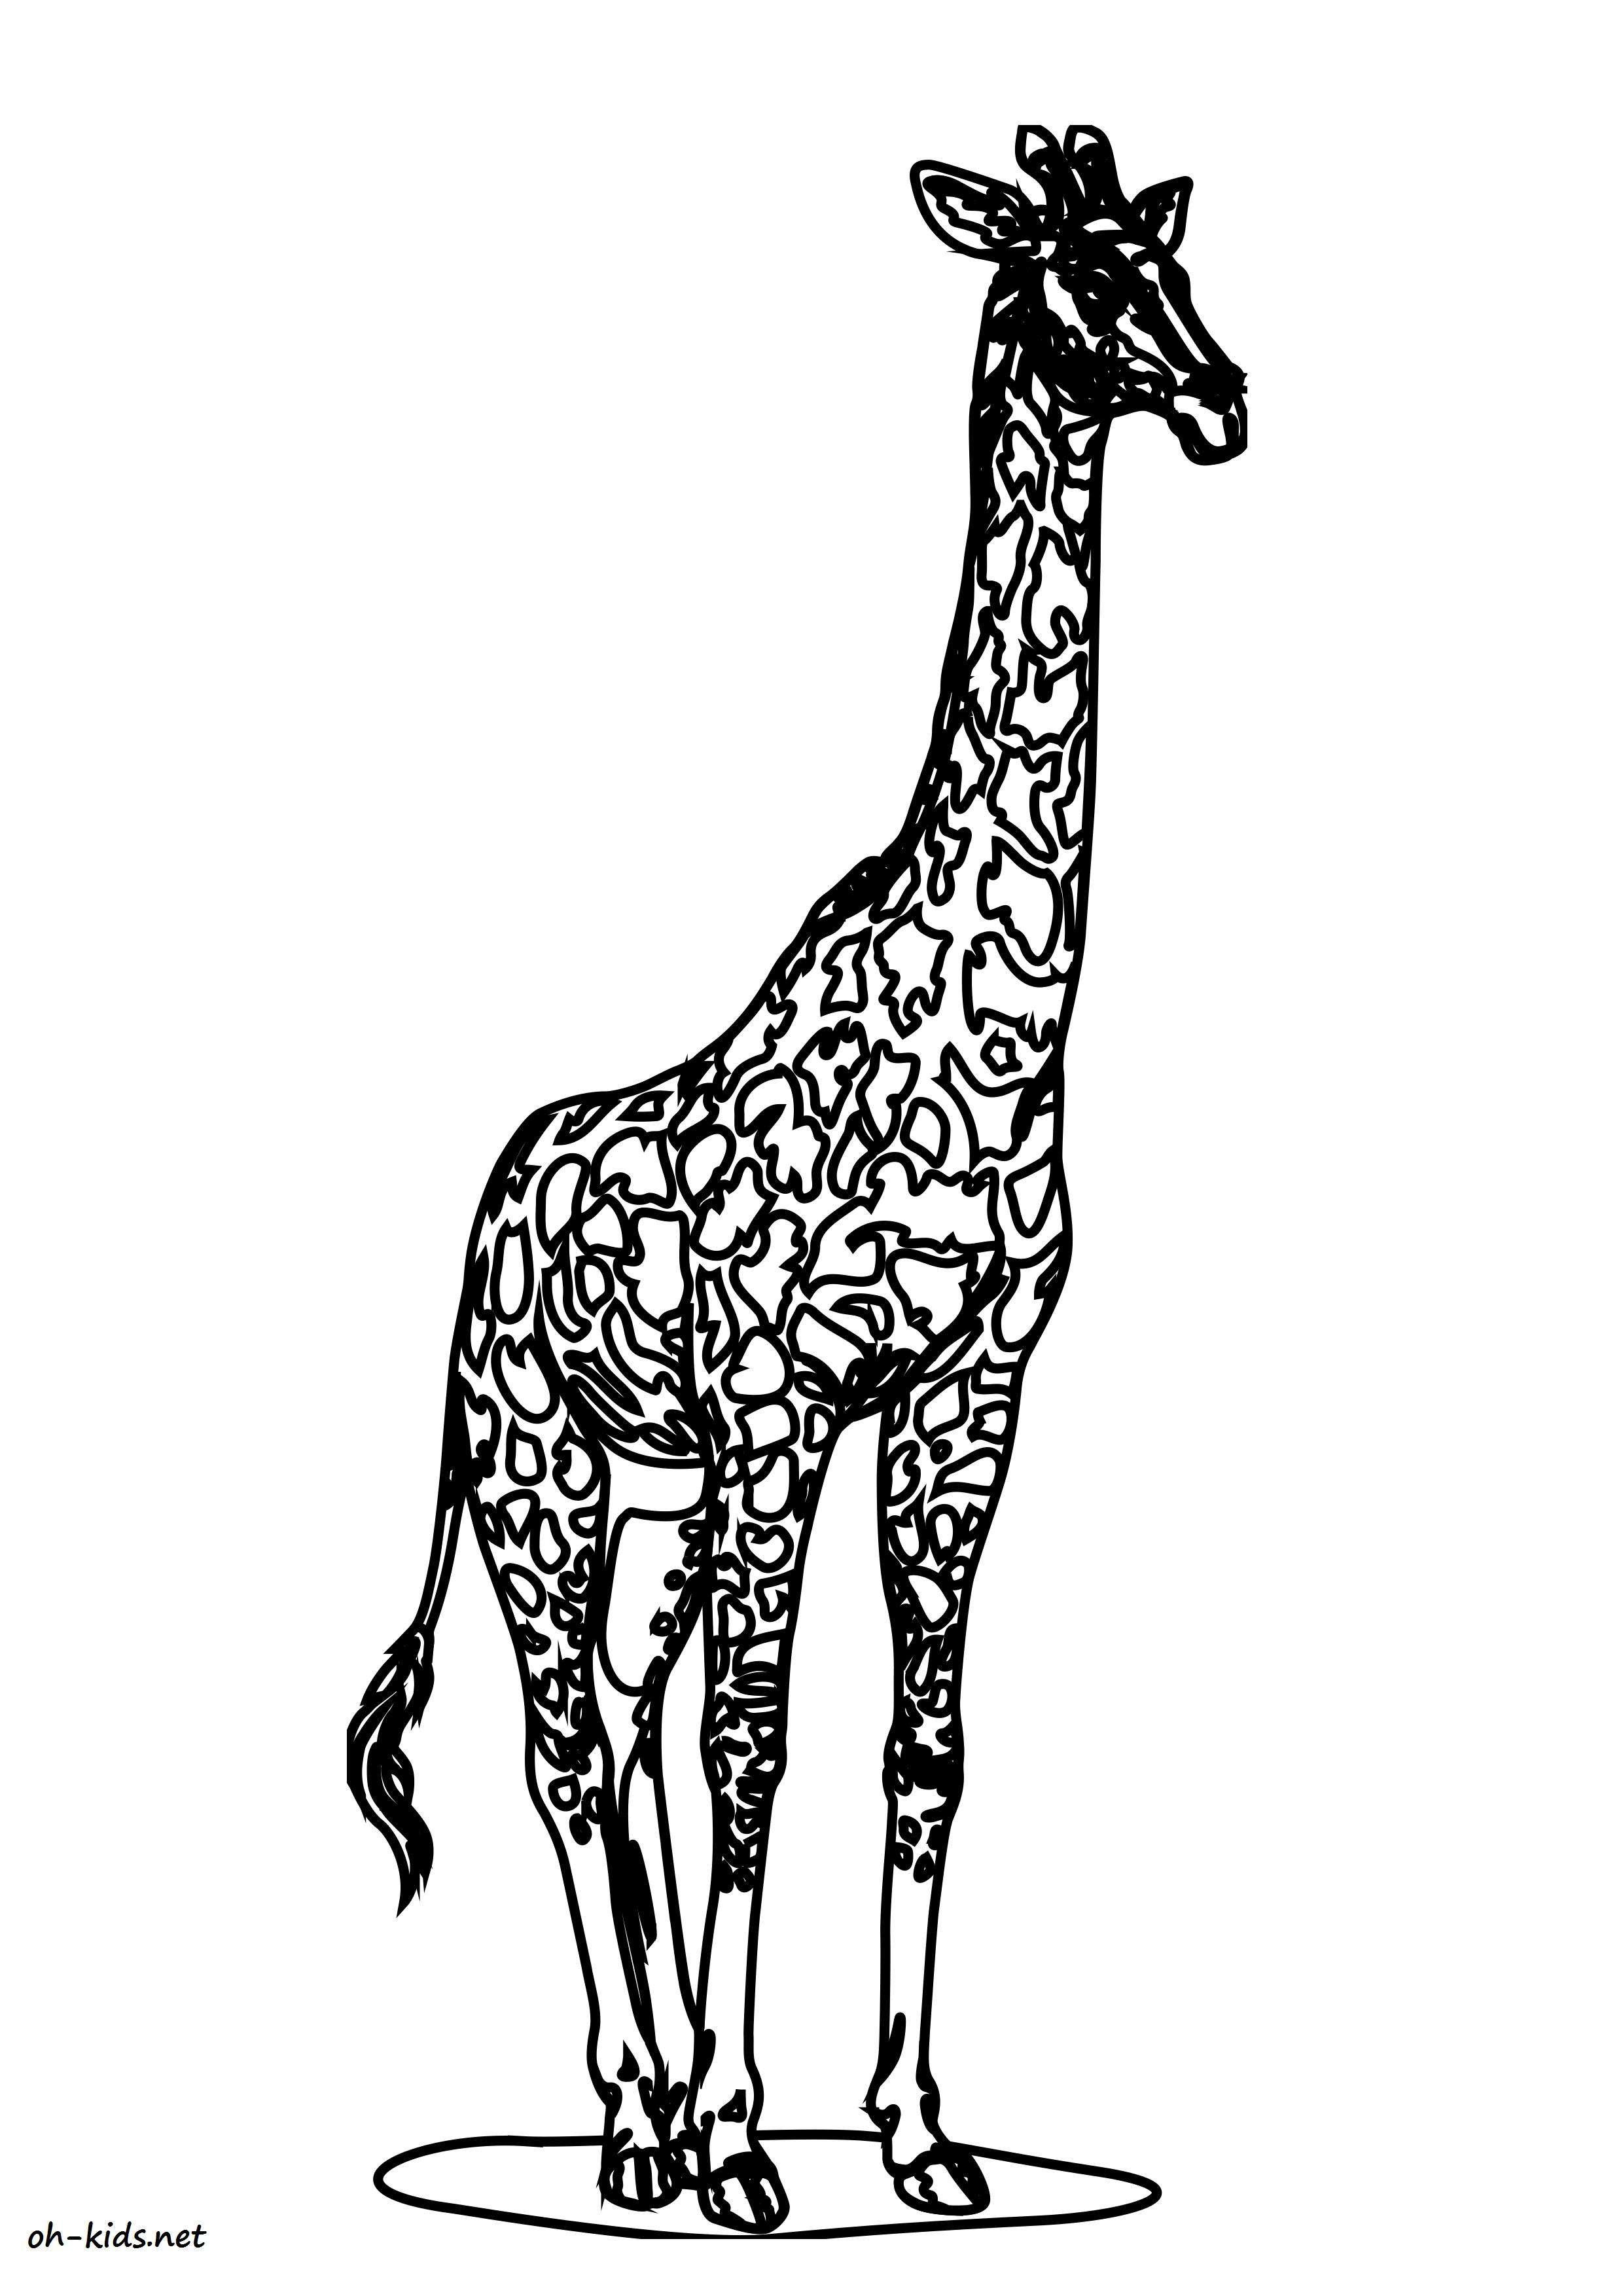 Coloriage Girafe - Oh Kids Fr dedans Coloriage Girafe A Imprimer Gratuit